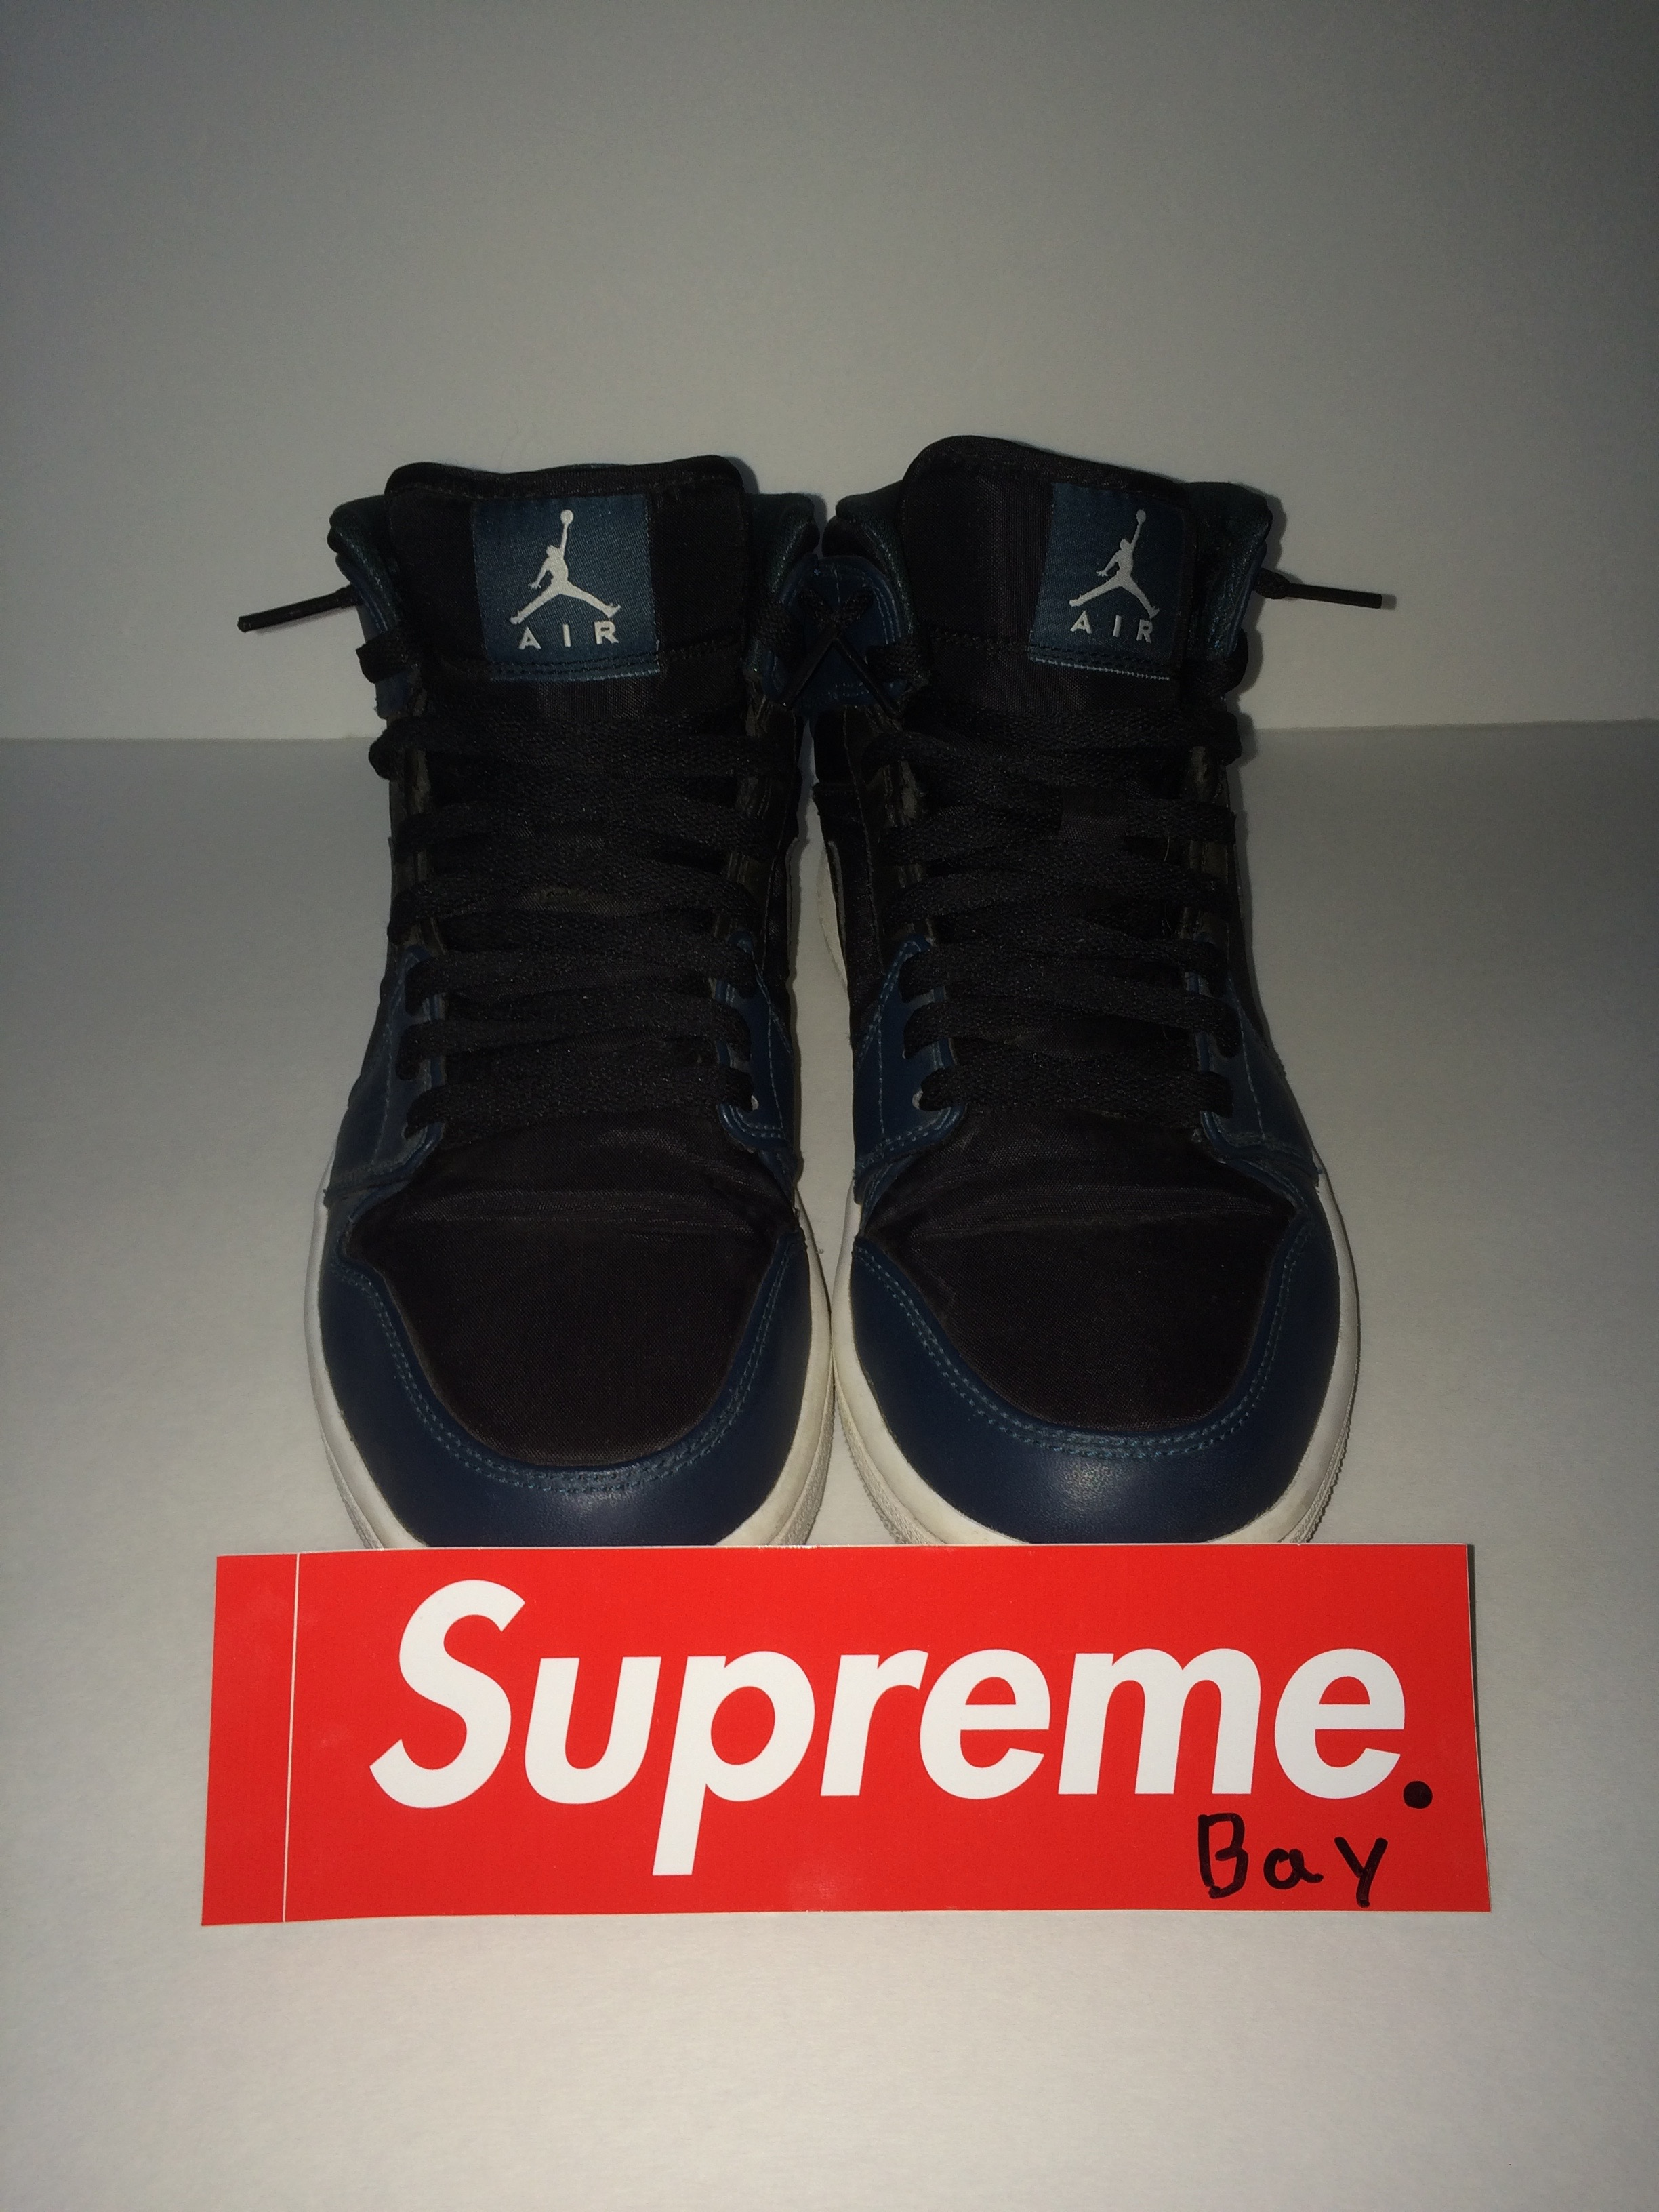 best website 3ab94 813b7 Air Jordan 1 Footlocker